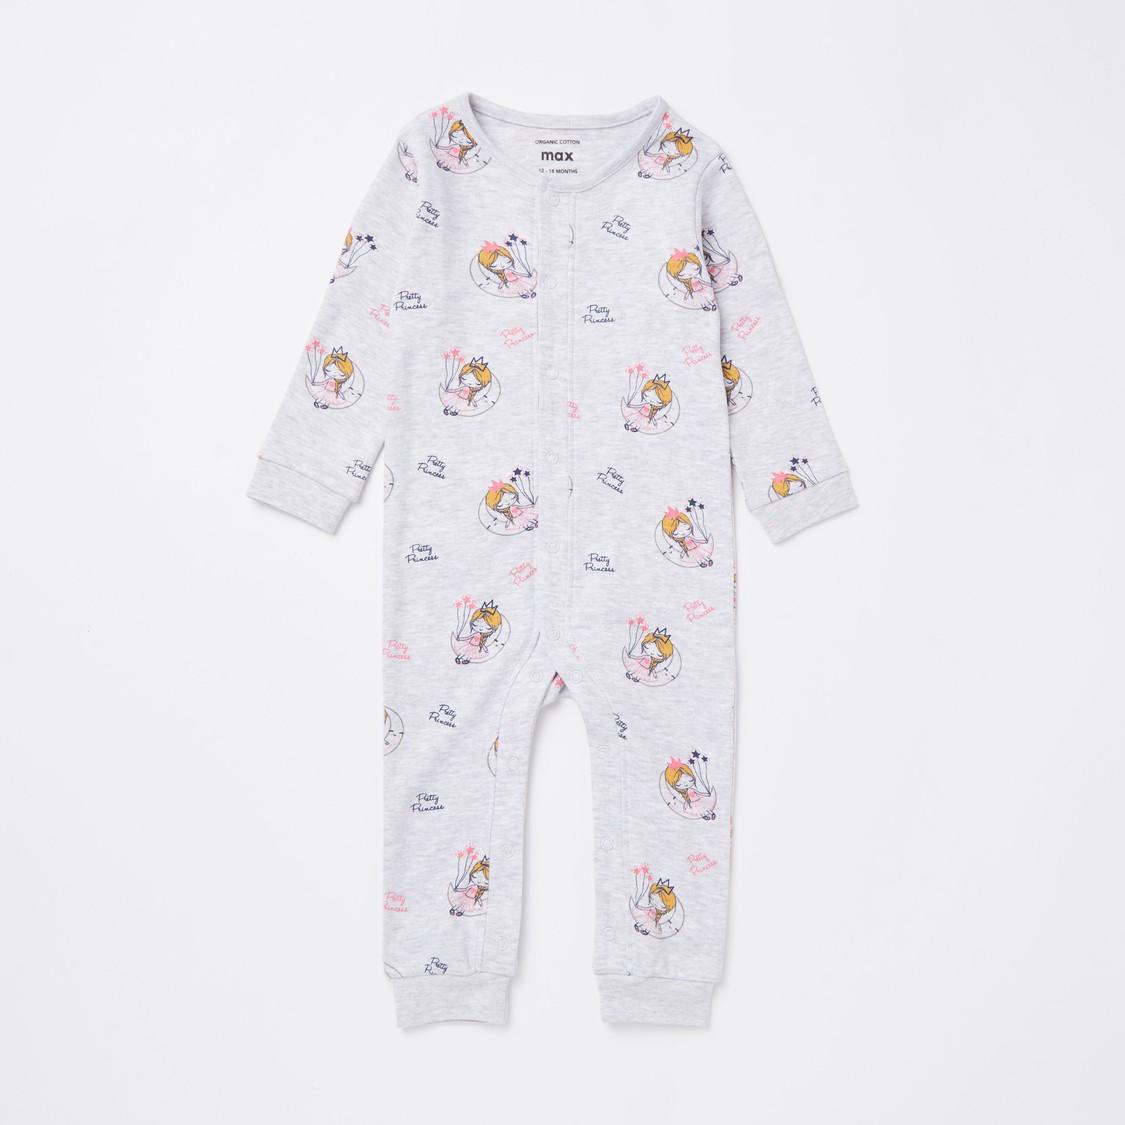 Printed Round Neck Sleepsuit and Beanie Cap Set